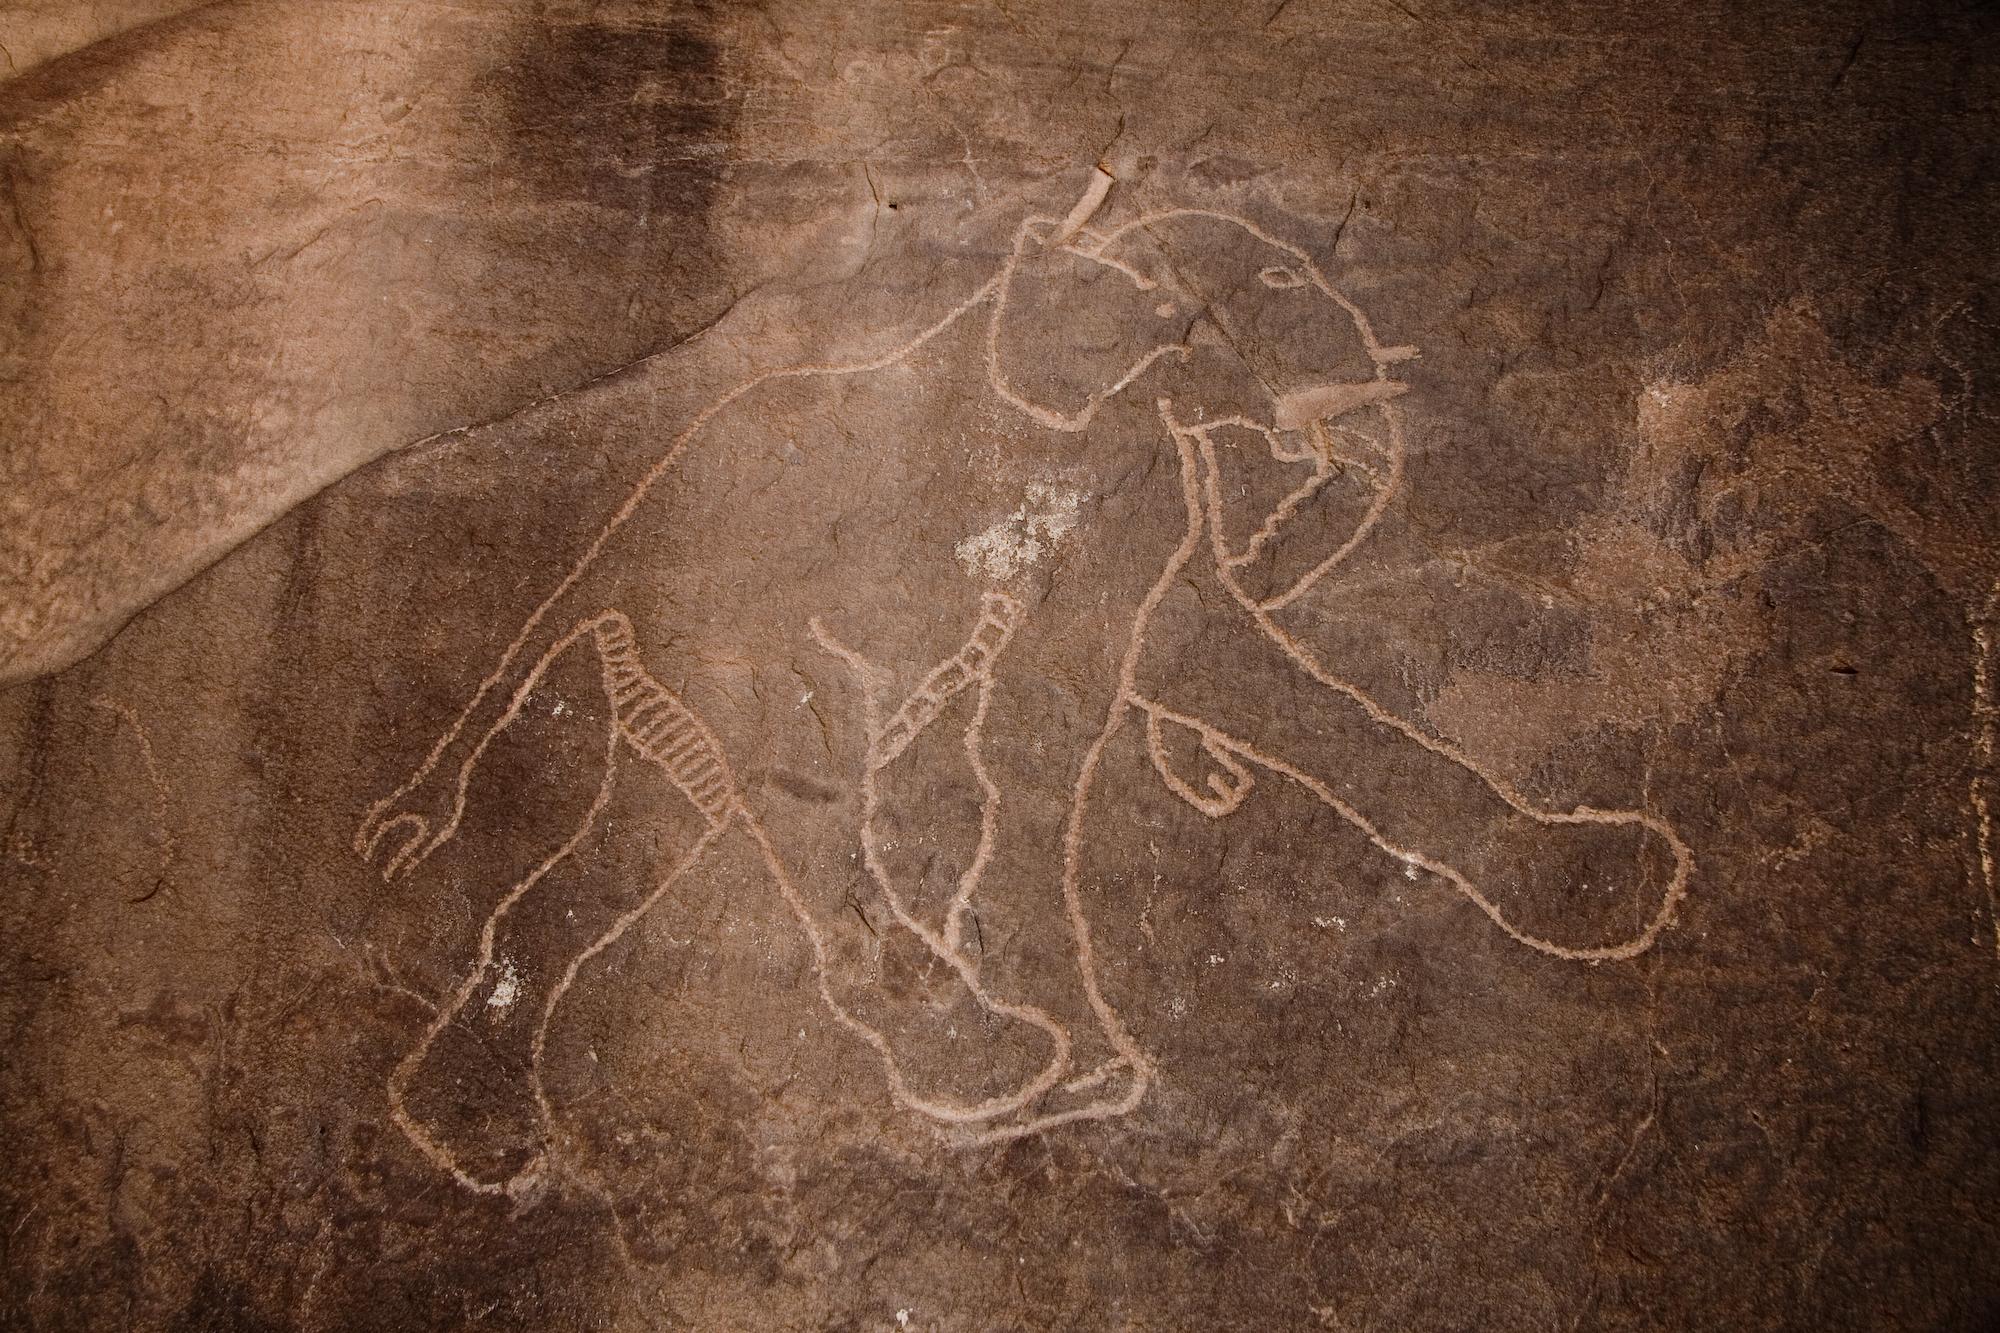 Libya 5041 Petroglyphs Tadrart Acacus Luca Galuzzi 2007.jpg